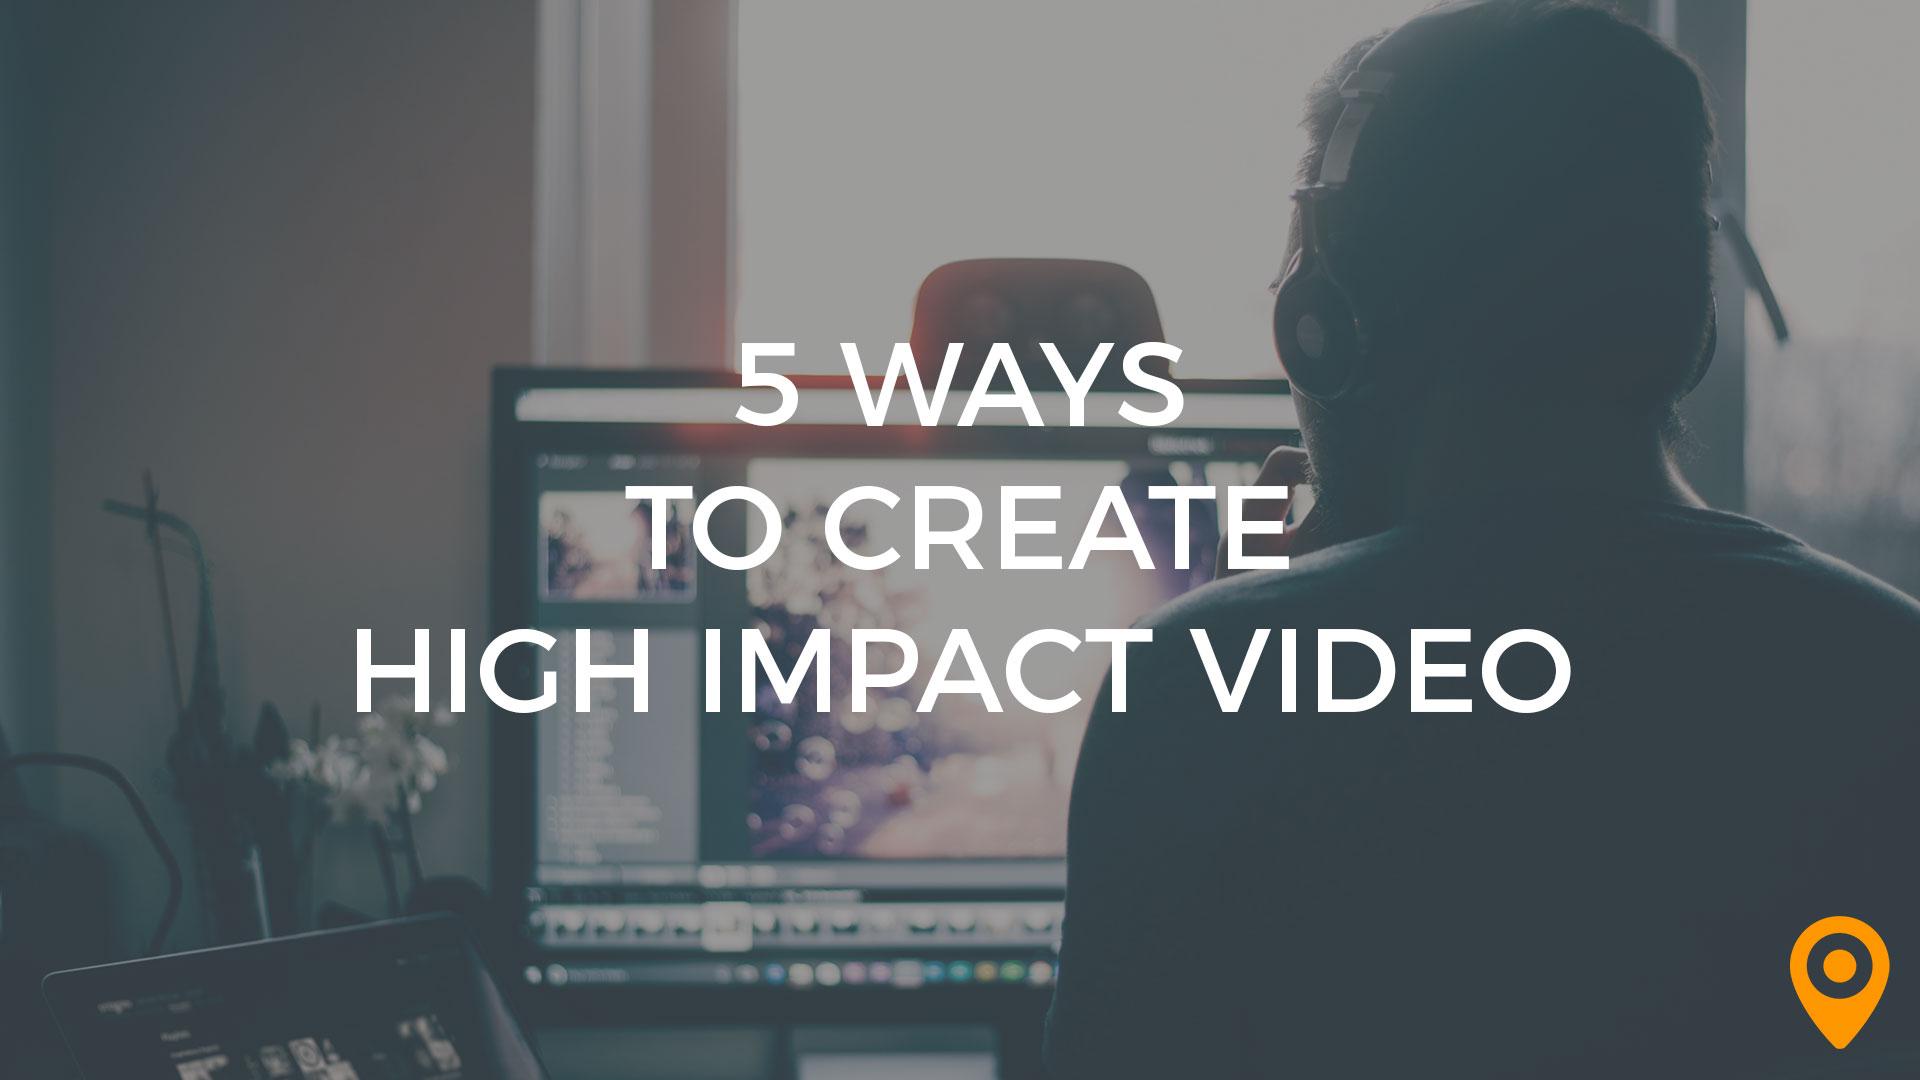 5 Ways to Create High Impact Video